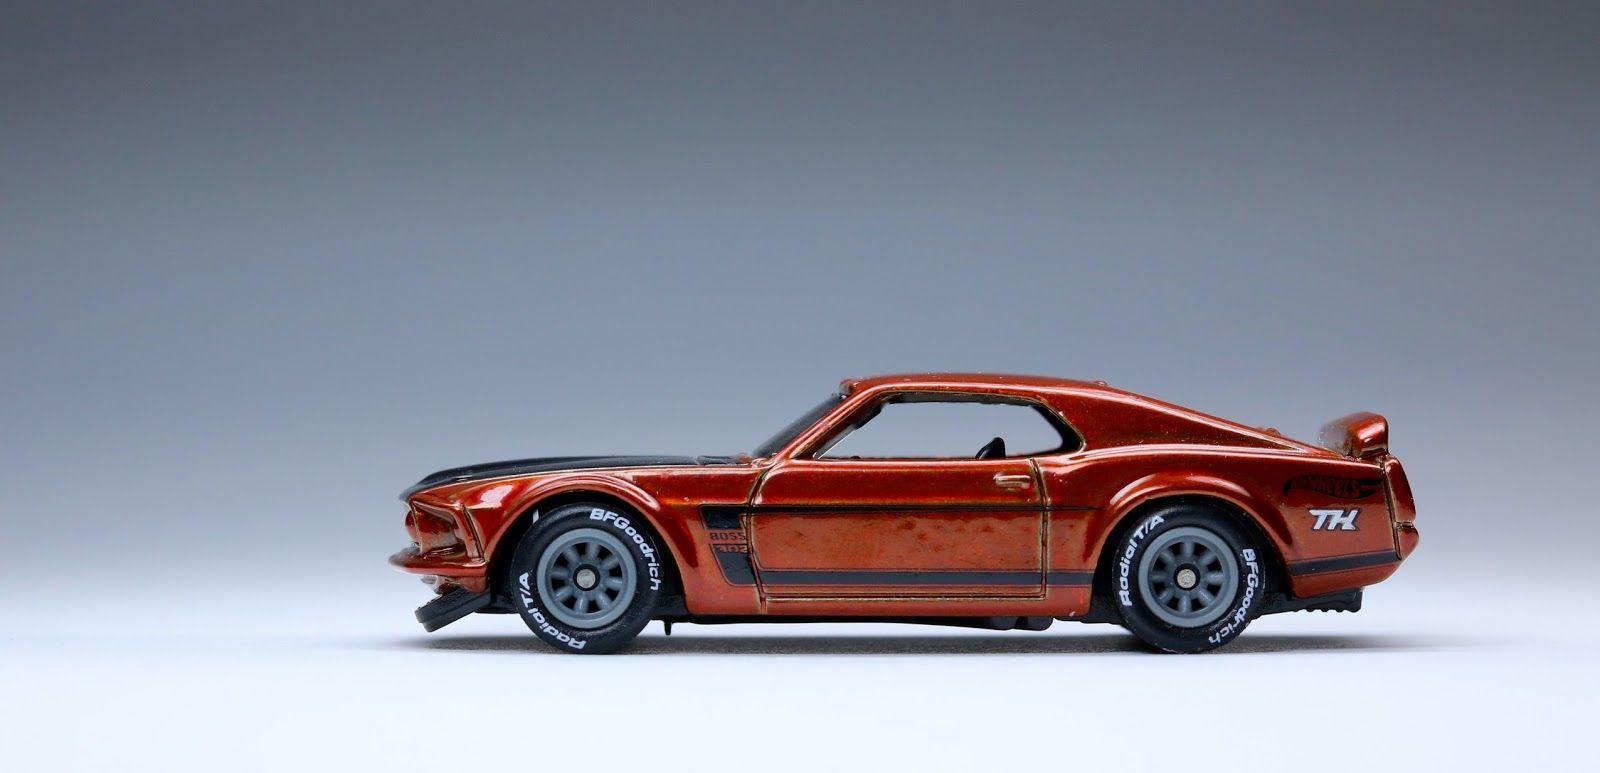 69 Ford Mustang Boss 302 - $TH '15 | Hot Wheels | Mustang